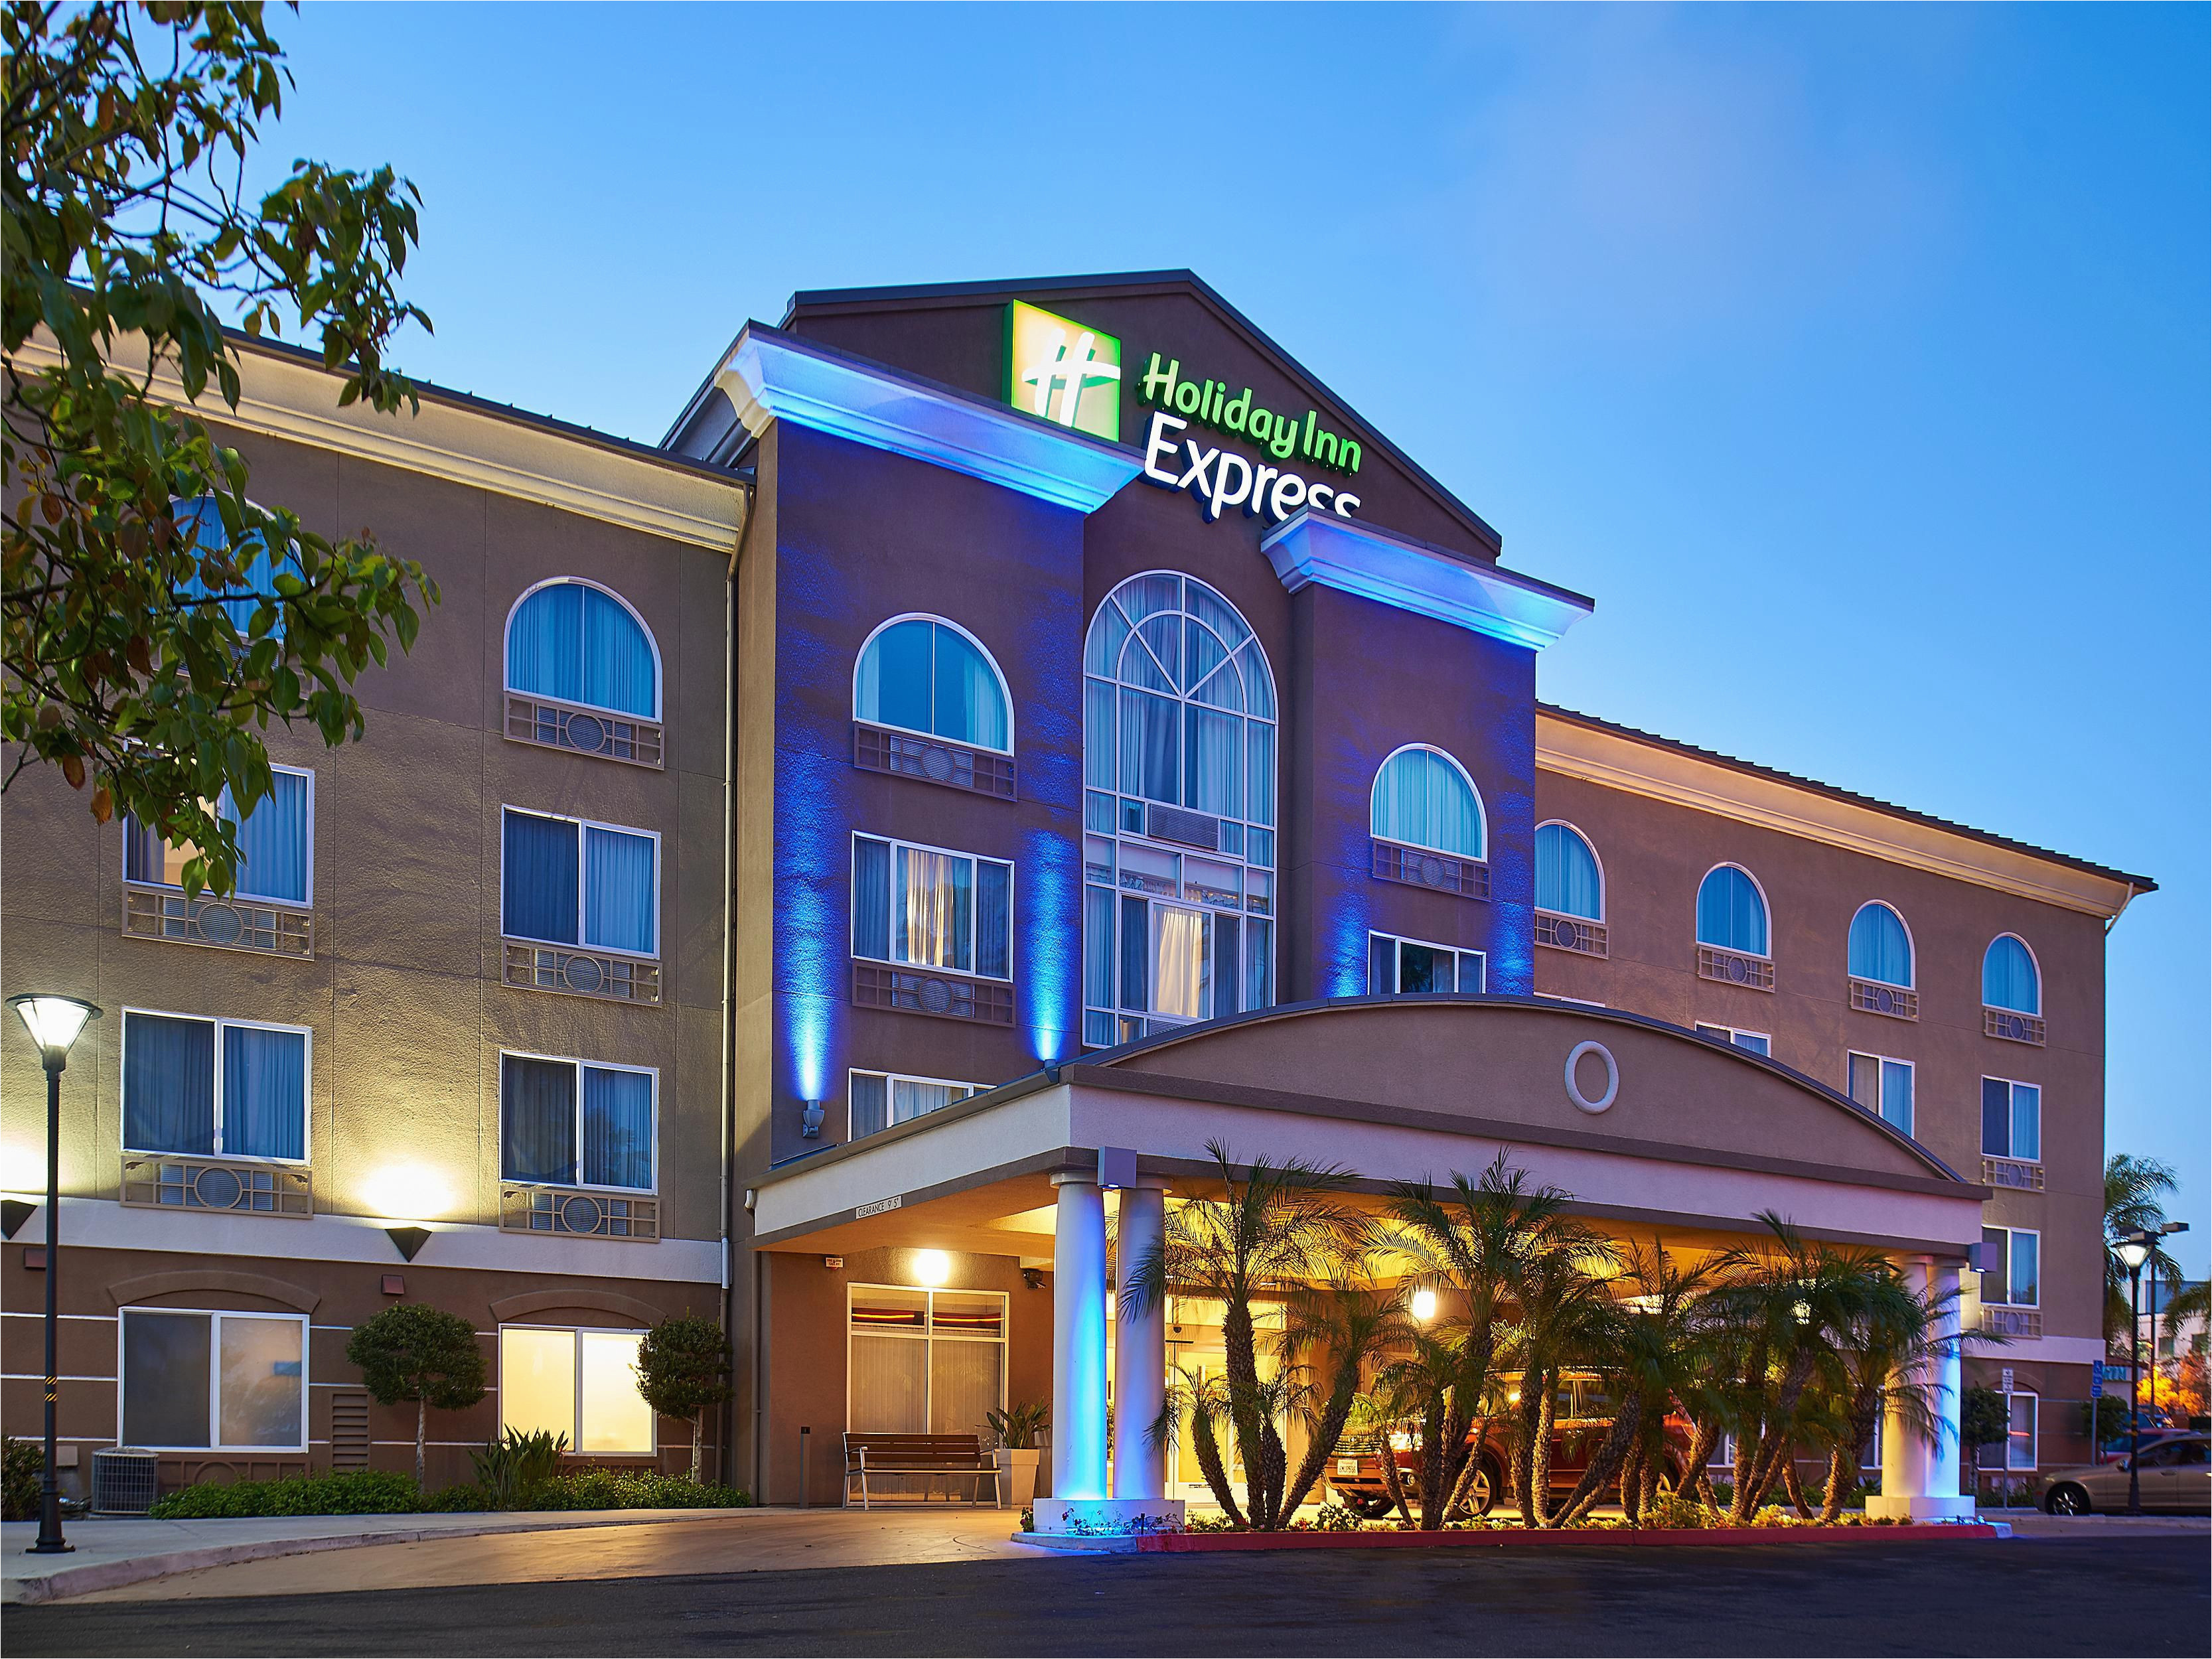 holiday inn express california locations map valid sacramento hotel